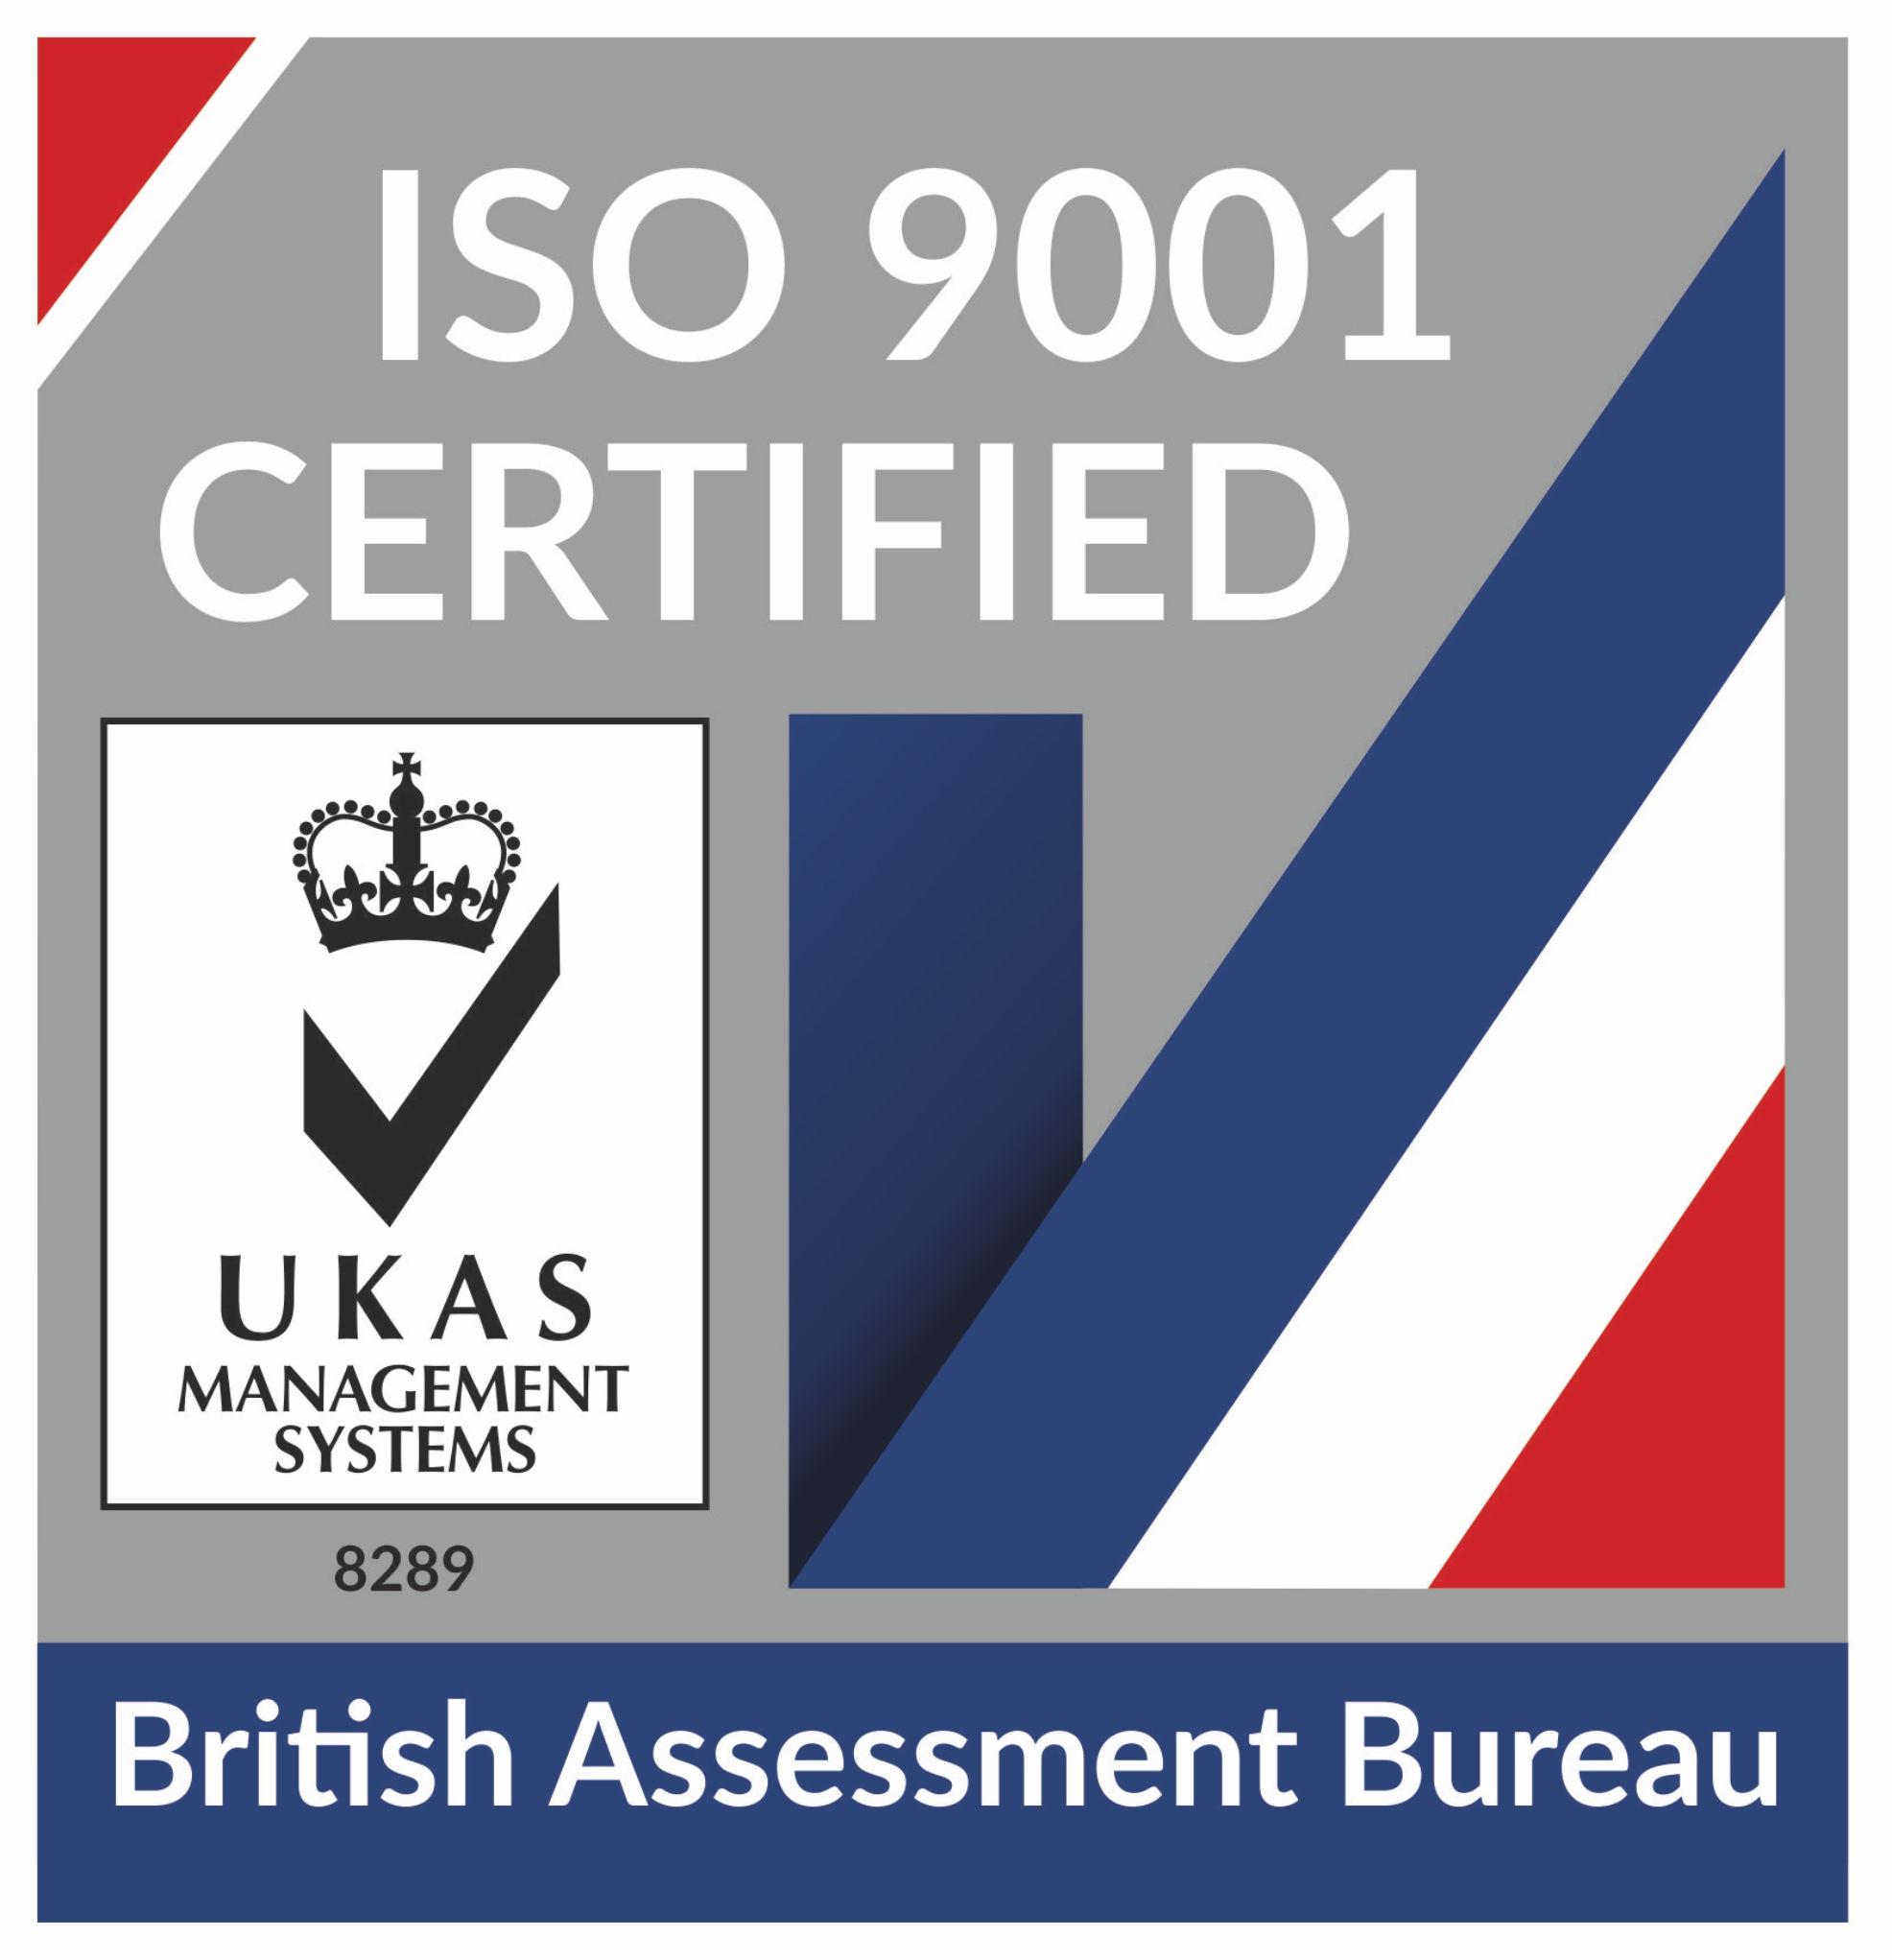 ISO9001 Certified logo